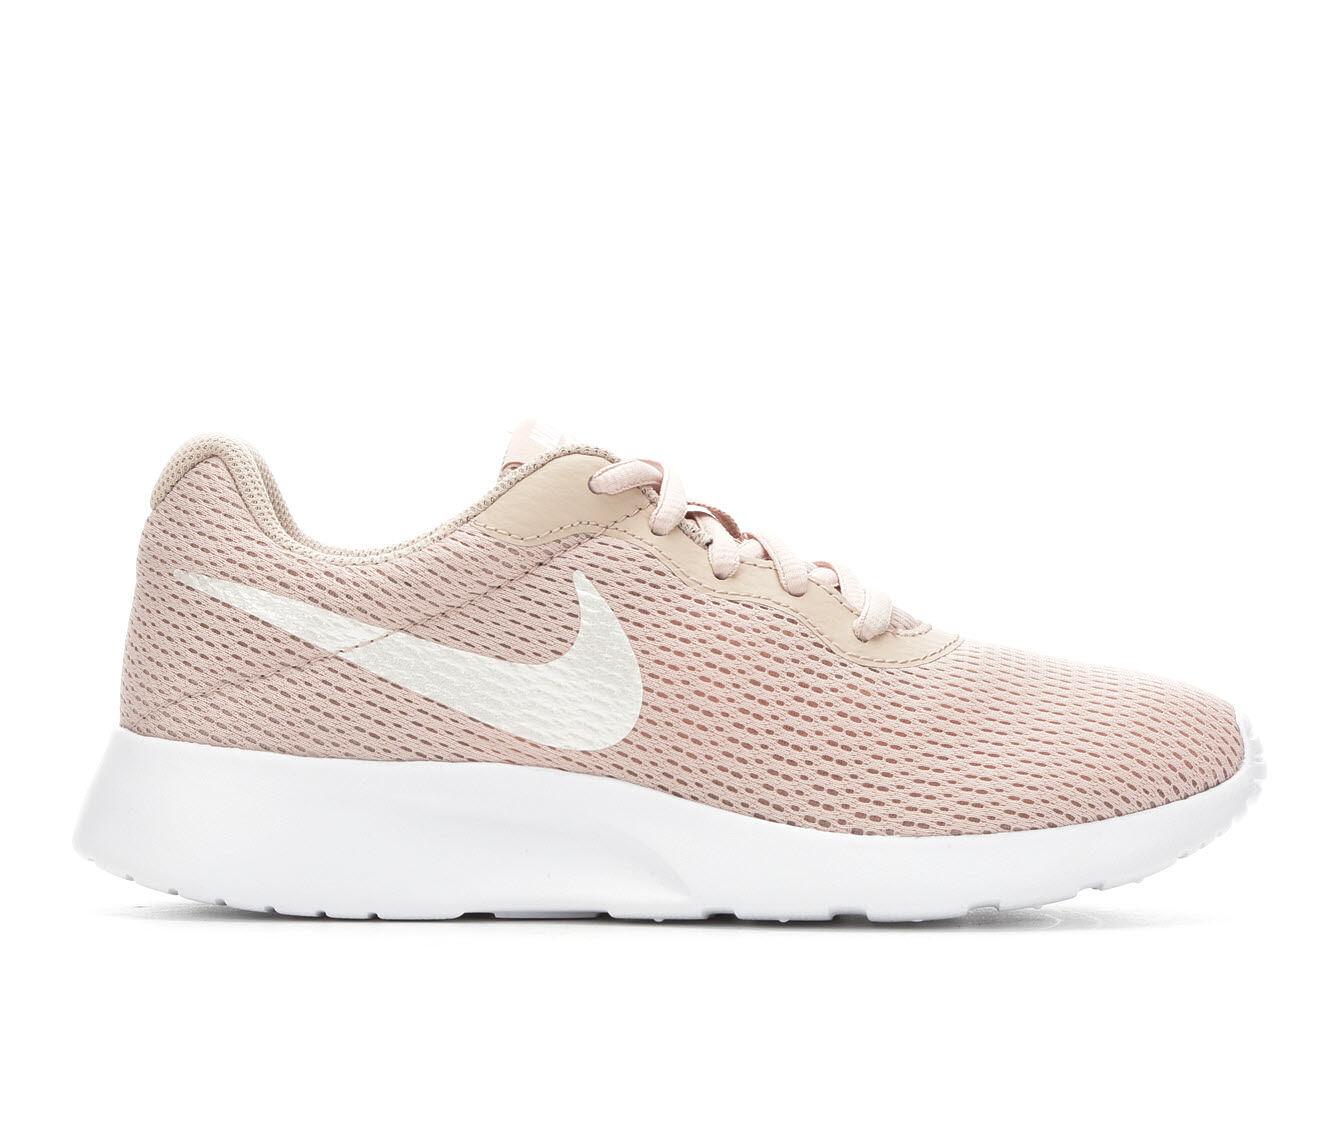 Women's Nike Tanjun Sneakers Beige/Phantom